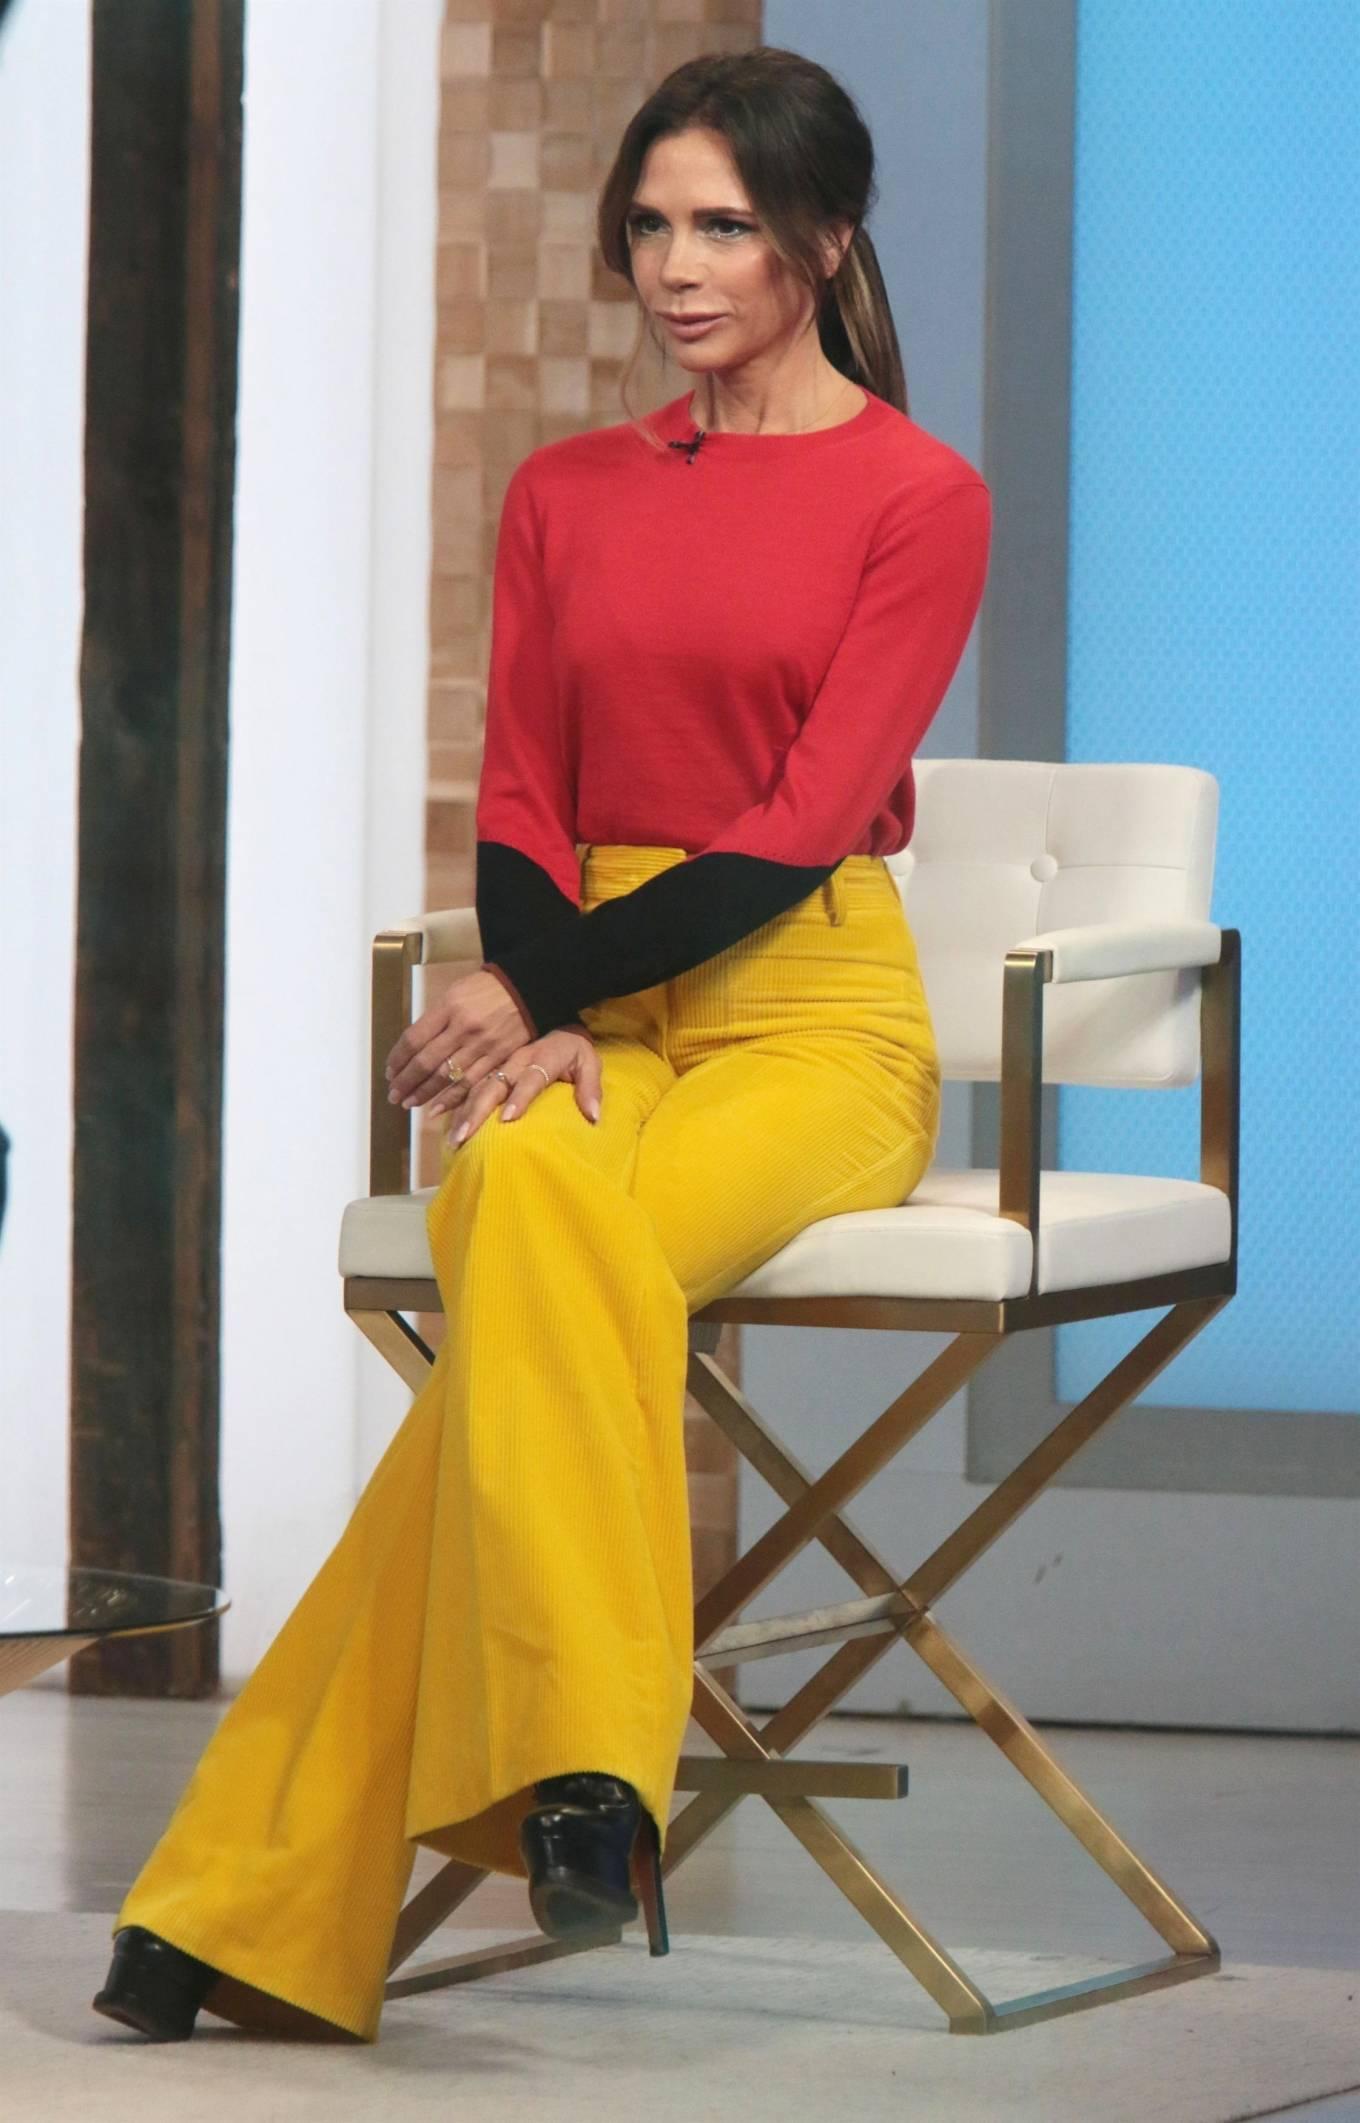 Victoria Beckham 2021 : Victoria Beckham – on Good Morning America promoting her new designer clothing in New York City-11